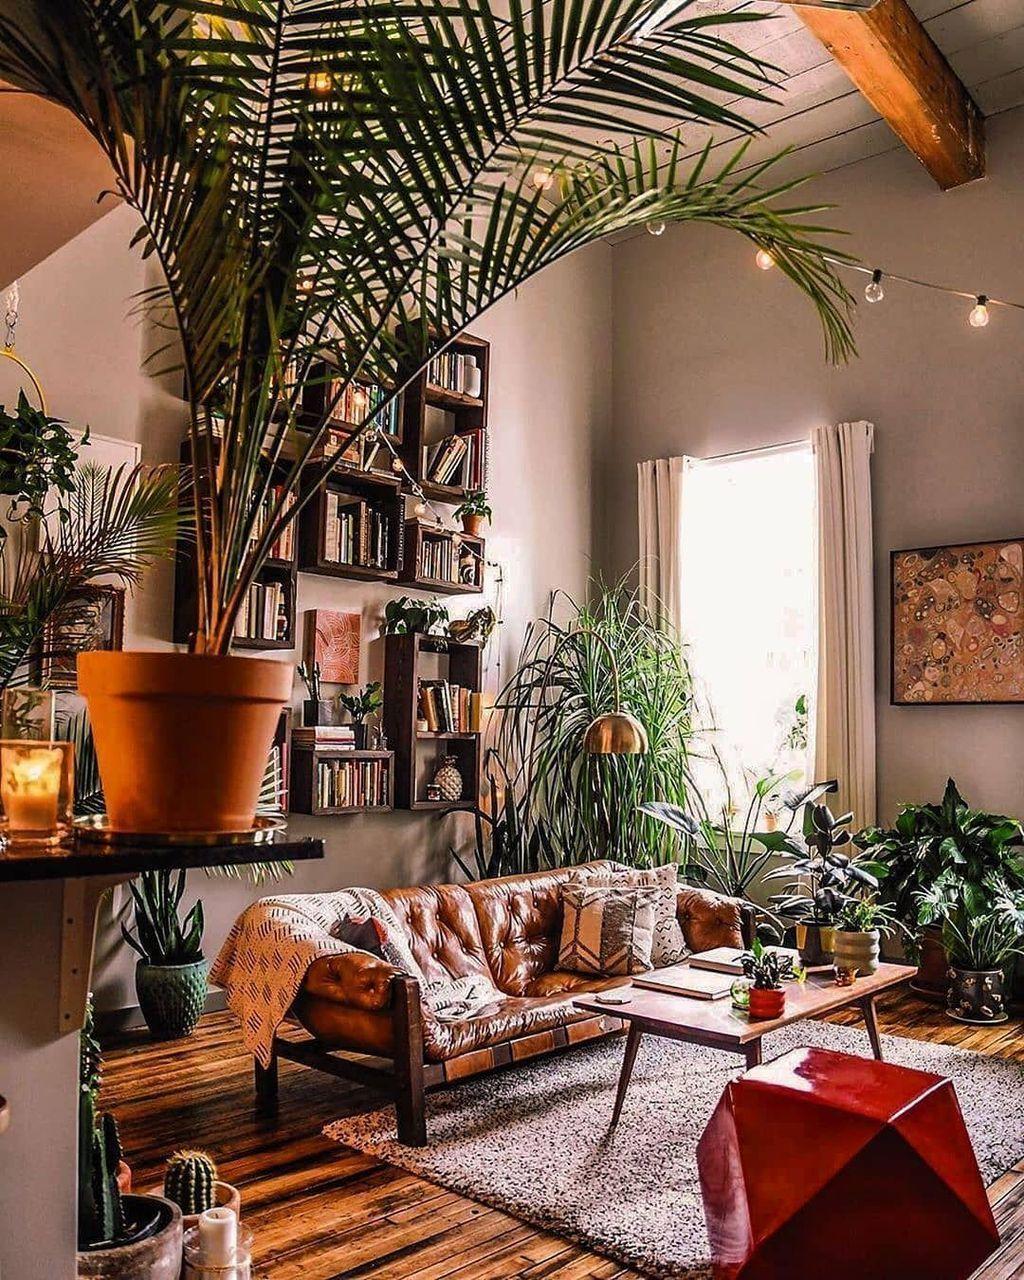 34 The Best Rustic Bohemian Living Room Decor Ideas 34 The Best Rustic Bohemi Bohemi Bo In 2020 Bohemian Living Room Decor Bohemian Living Room Boho Living Room